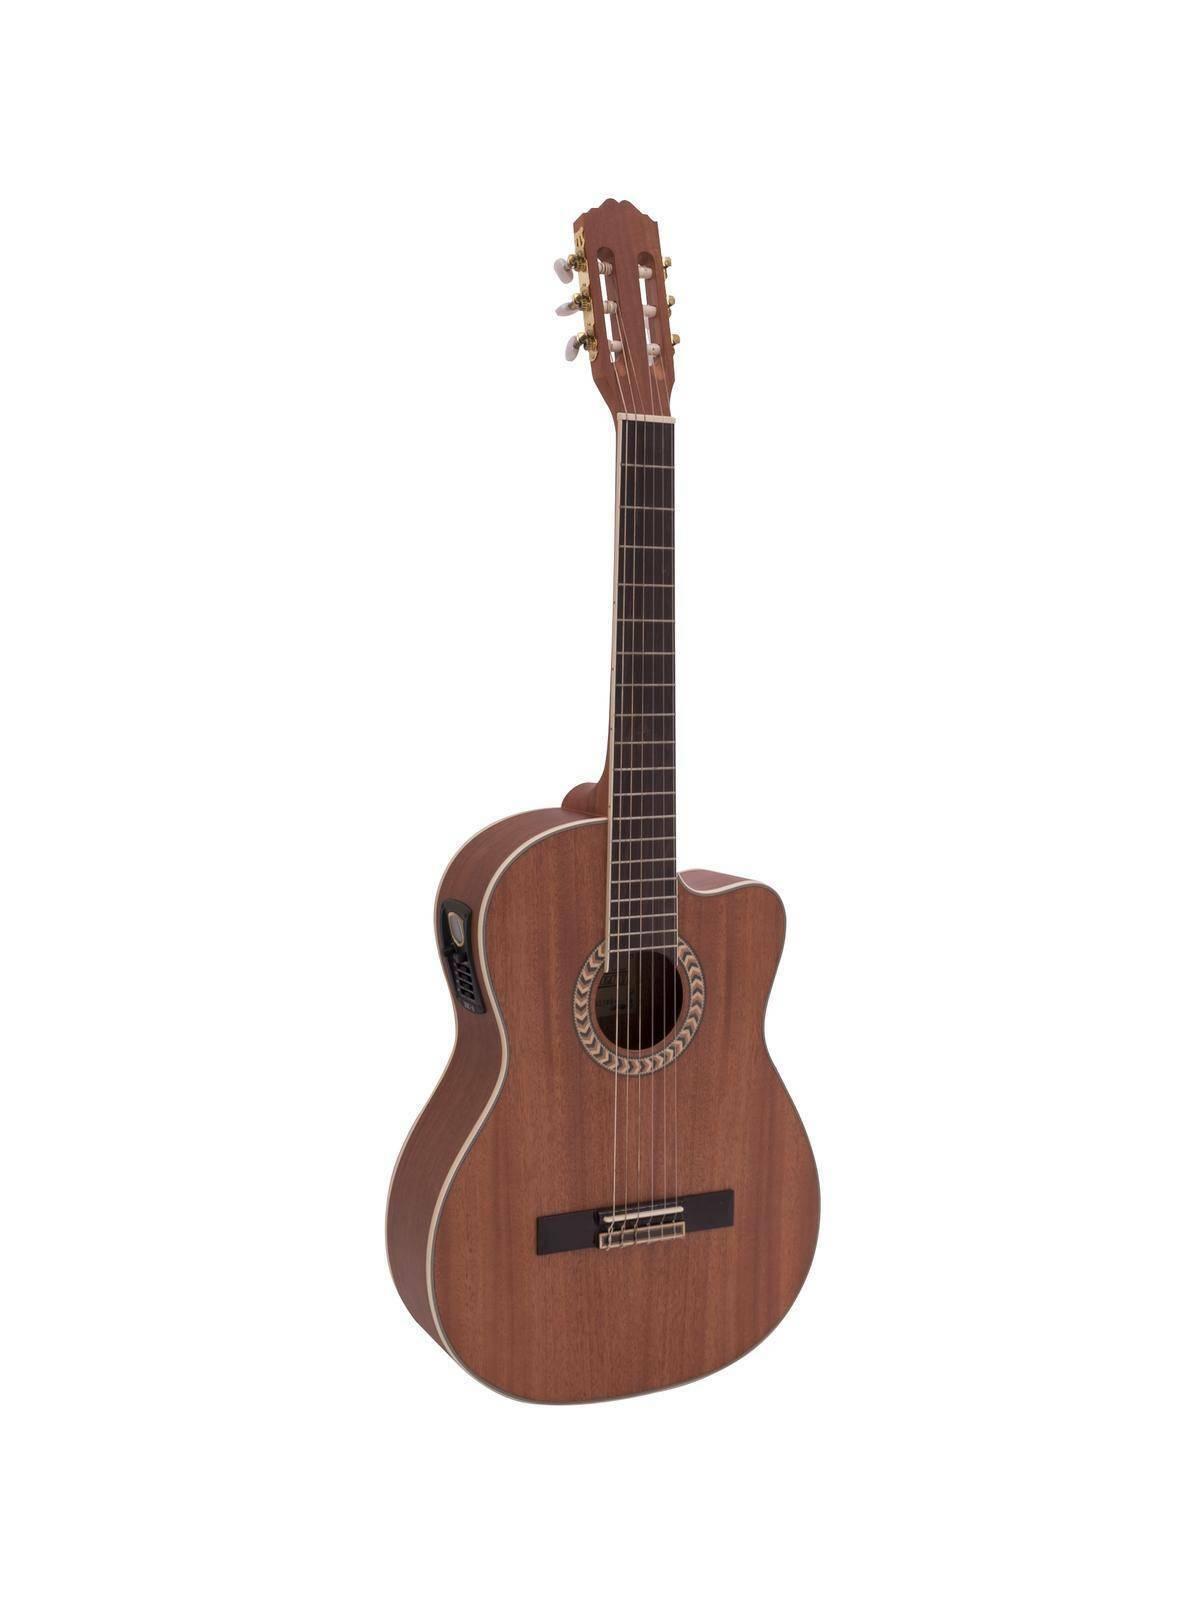 Konzertgitarre WILLIAM aus Mahagoni, Tonabnehmer, dunkelbraun   Konzert Gitarre